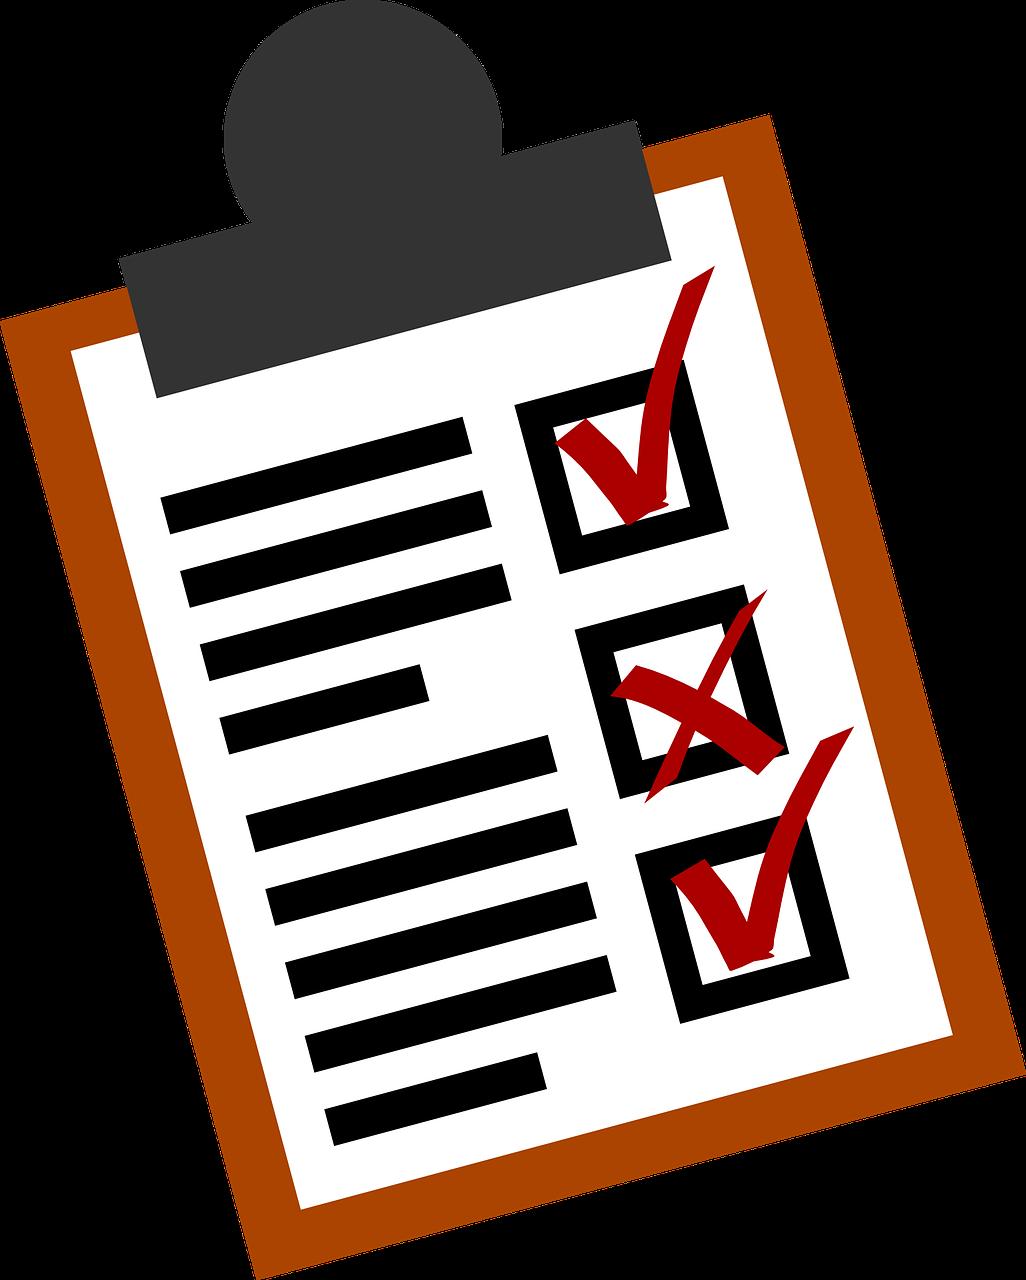 Checklist,lists,business,form,checkbox - free image from needpix.com